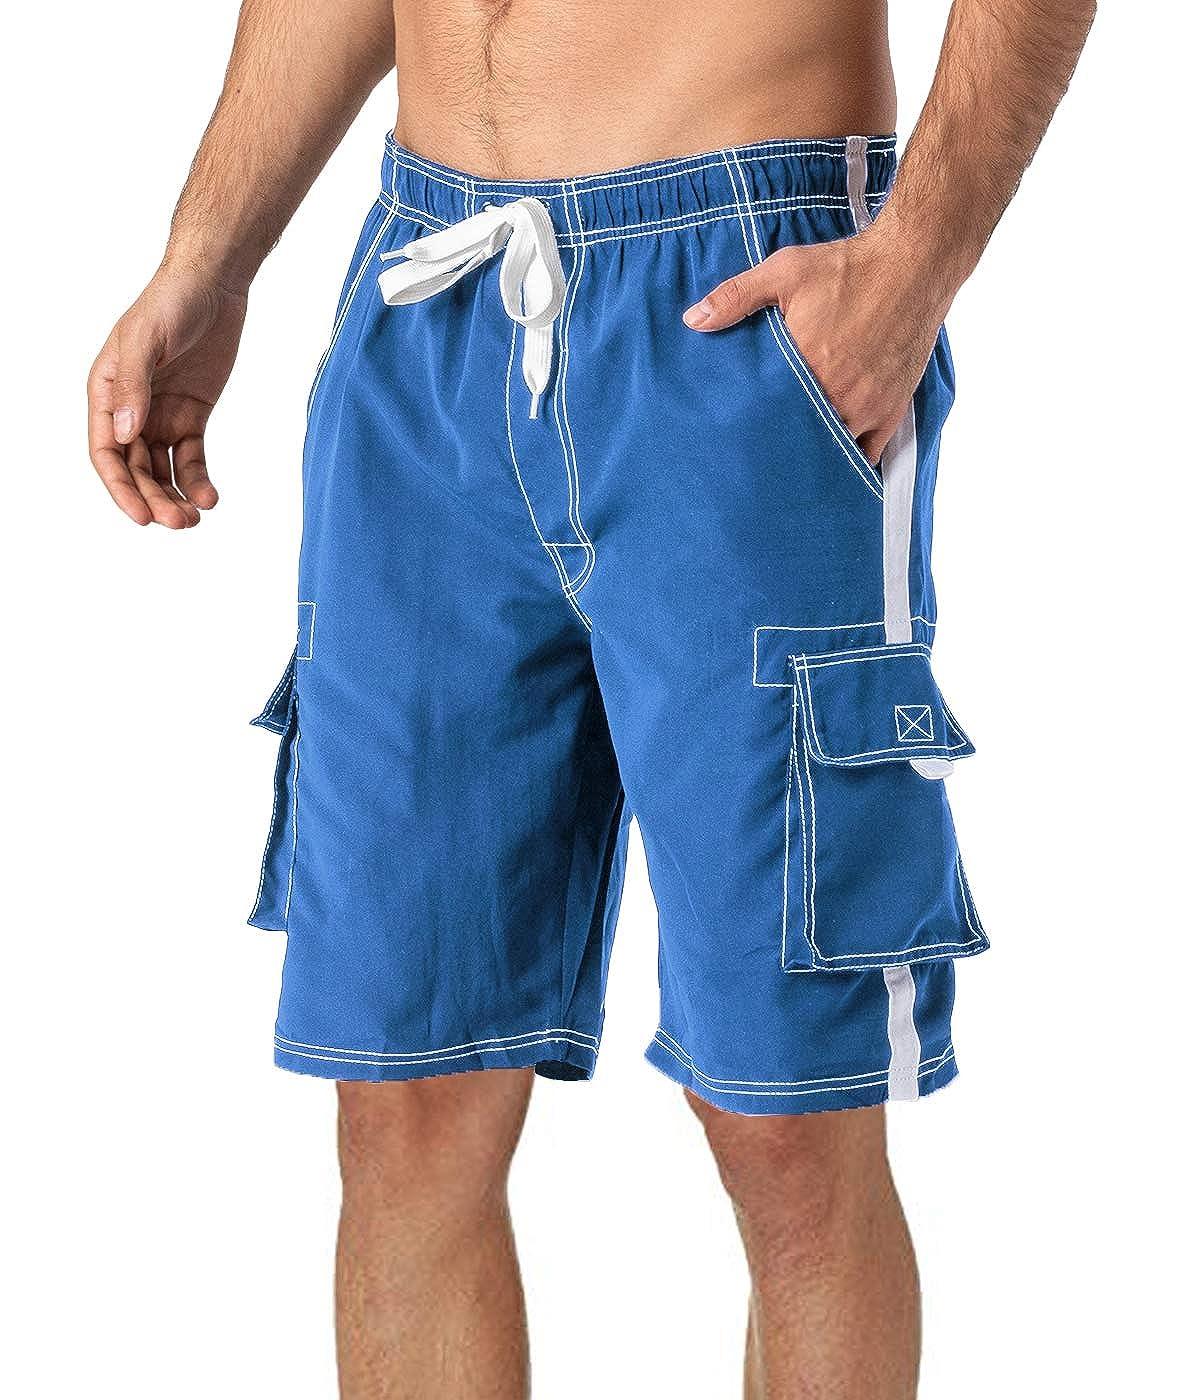 MAGCOMSEN Mens Swim Trunks with Mesh Liner 4 Pockets Quick Dry Beachwear Swimuits Board Shorts